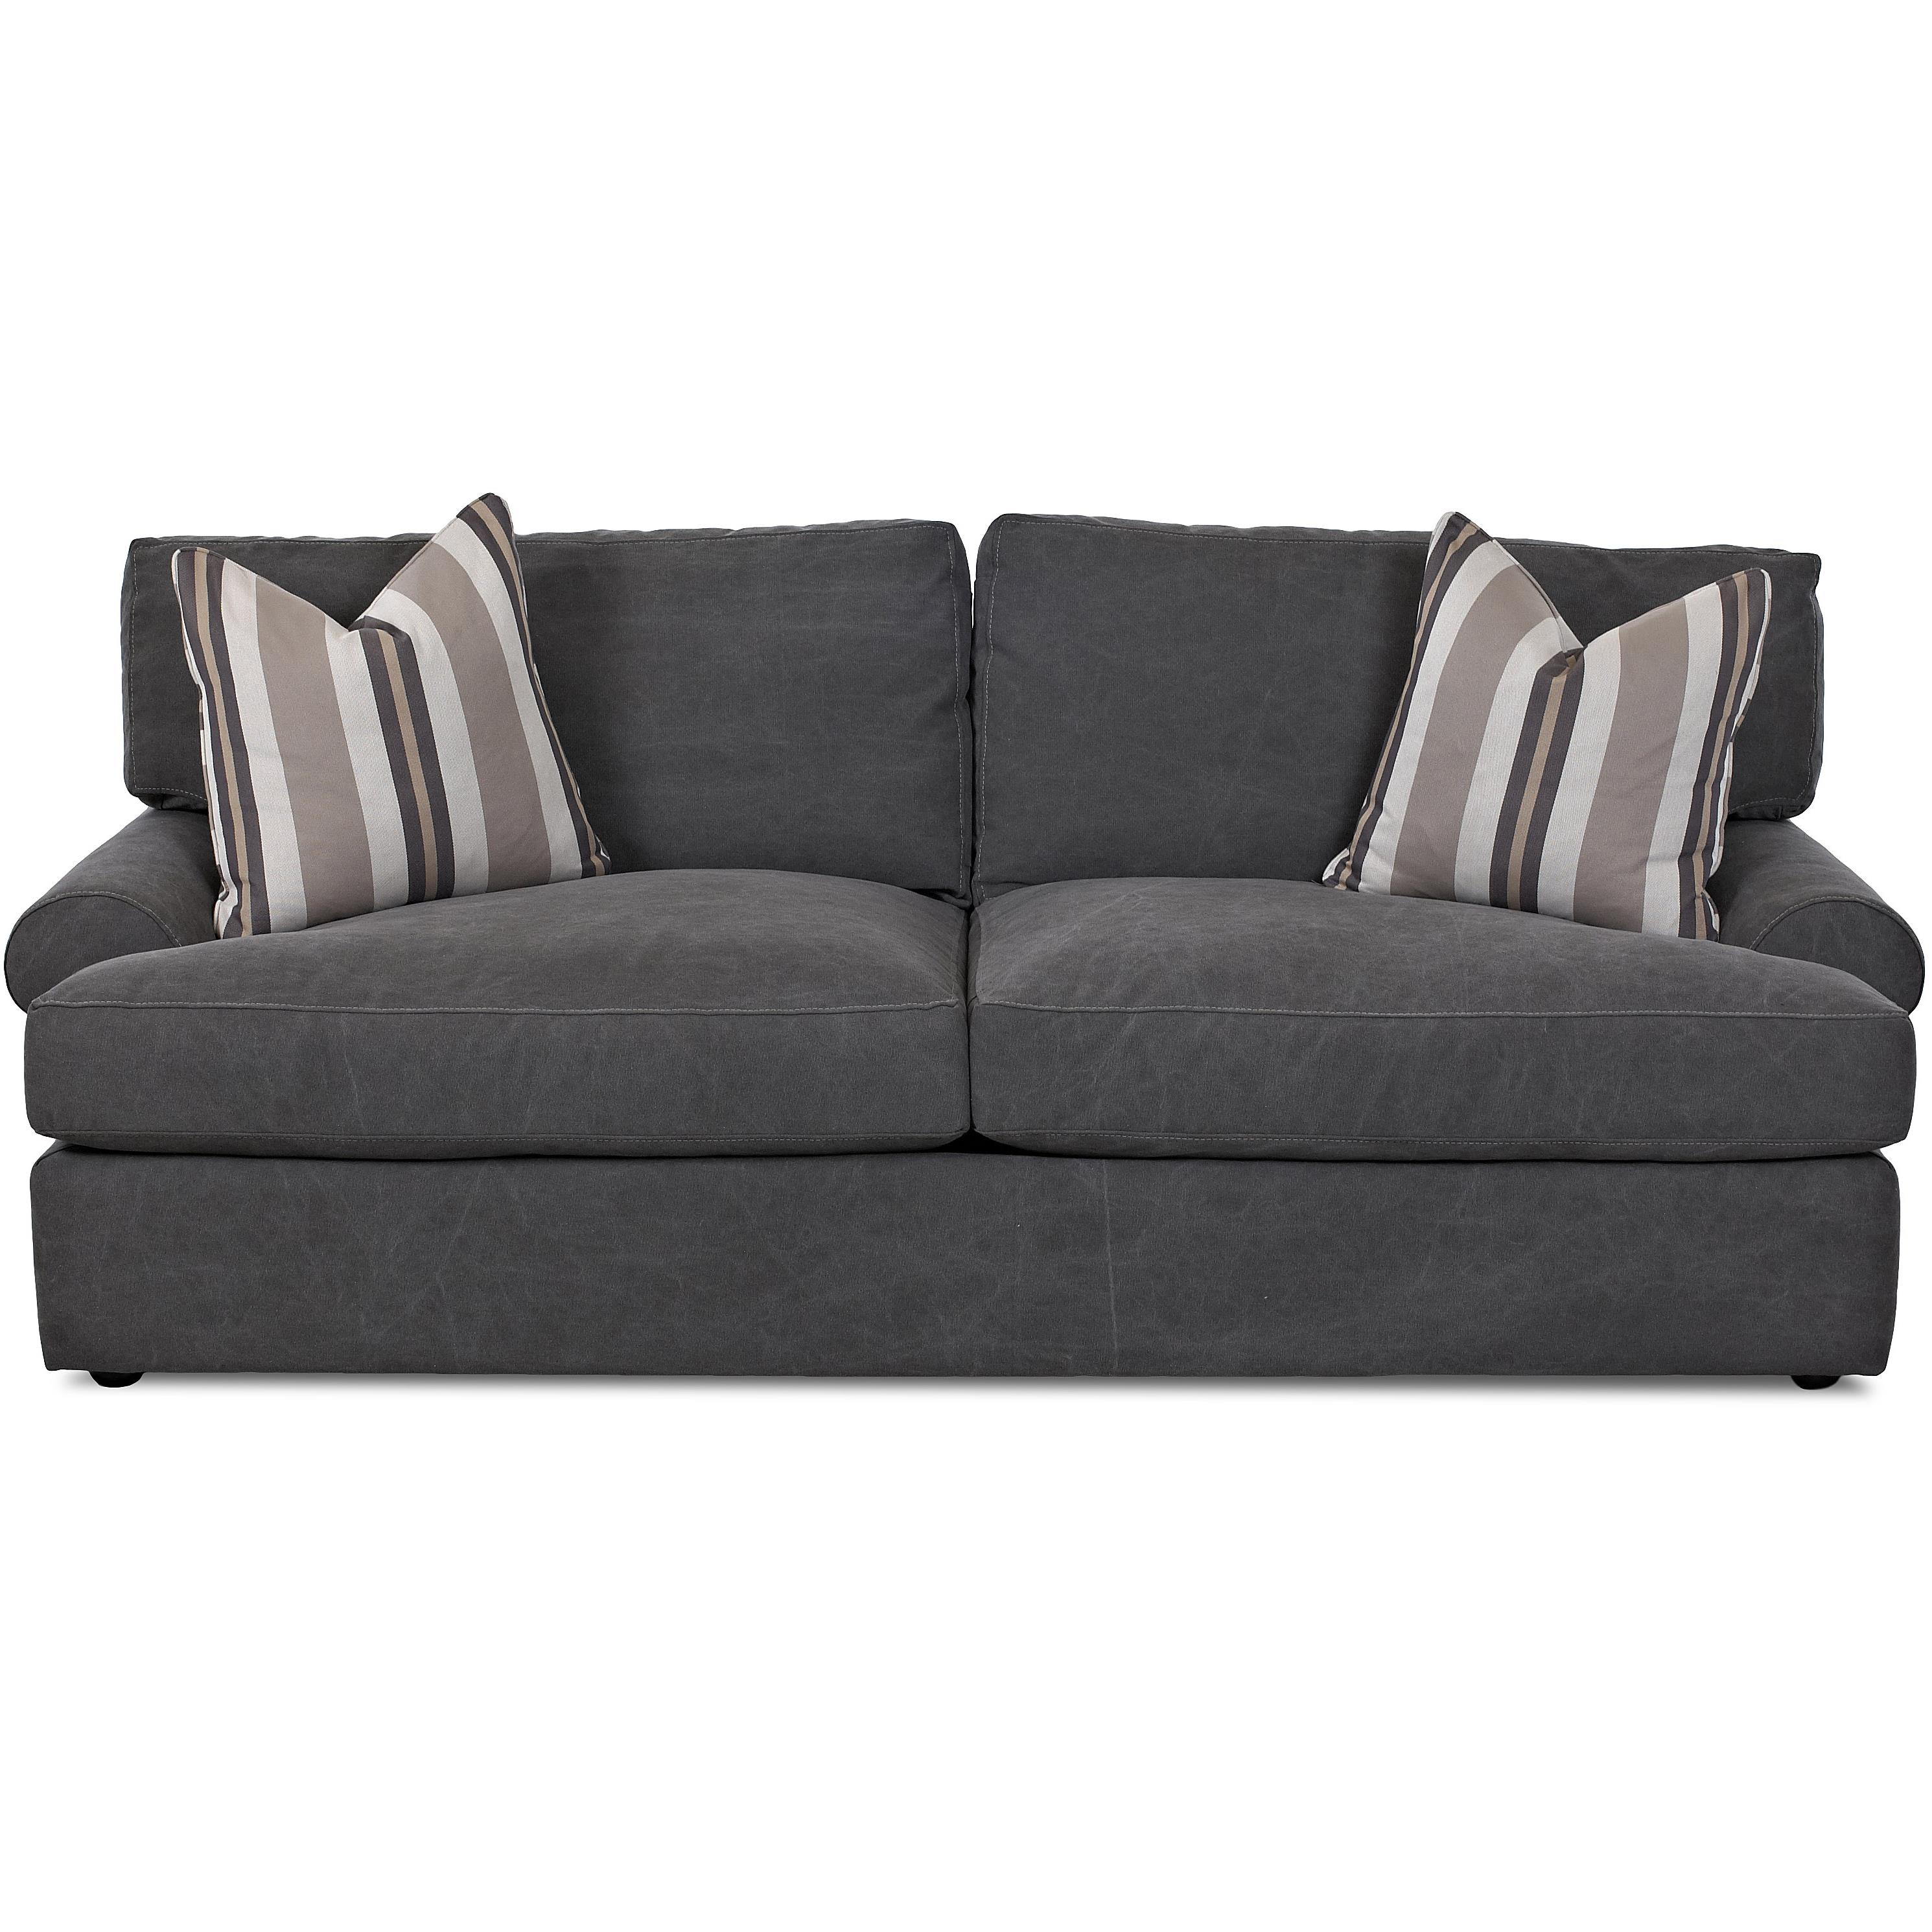 Sofa w/ 2 Pillows